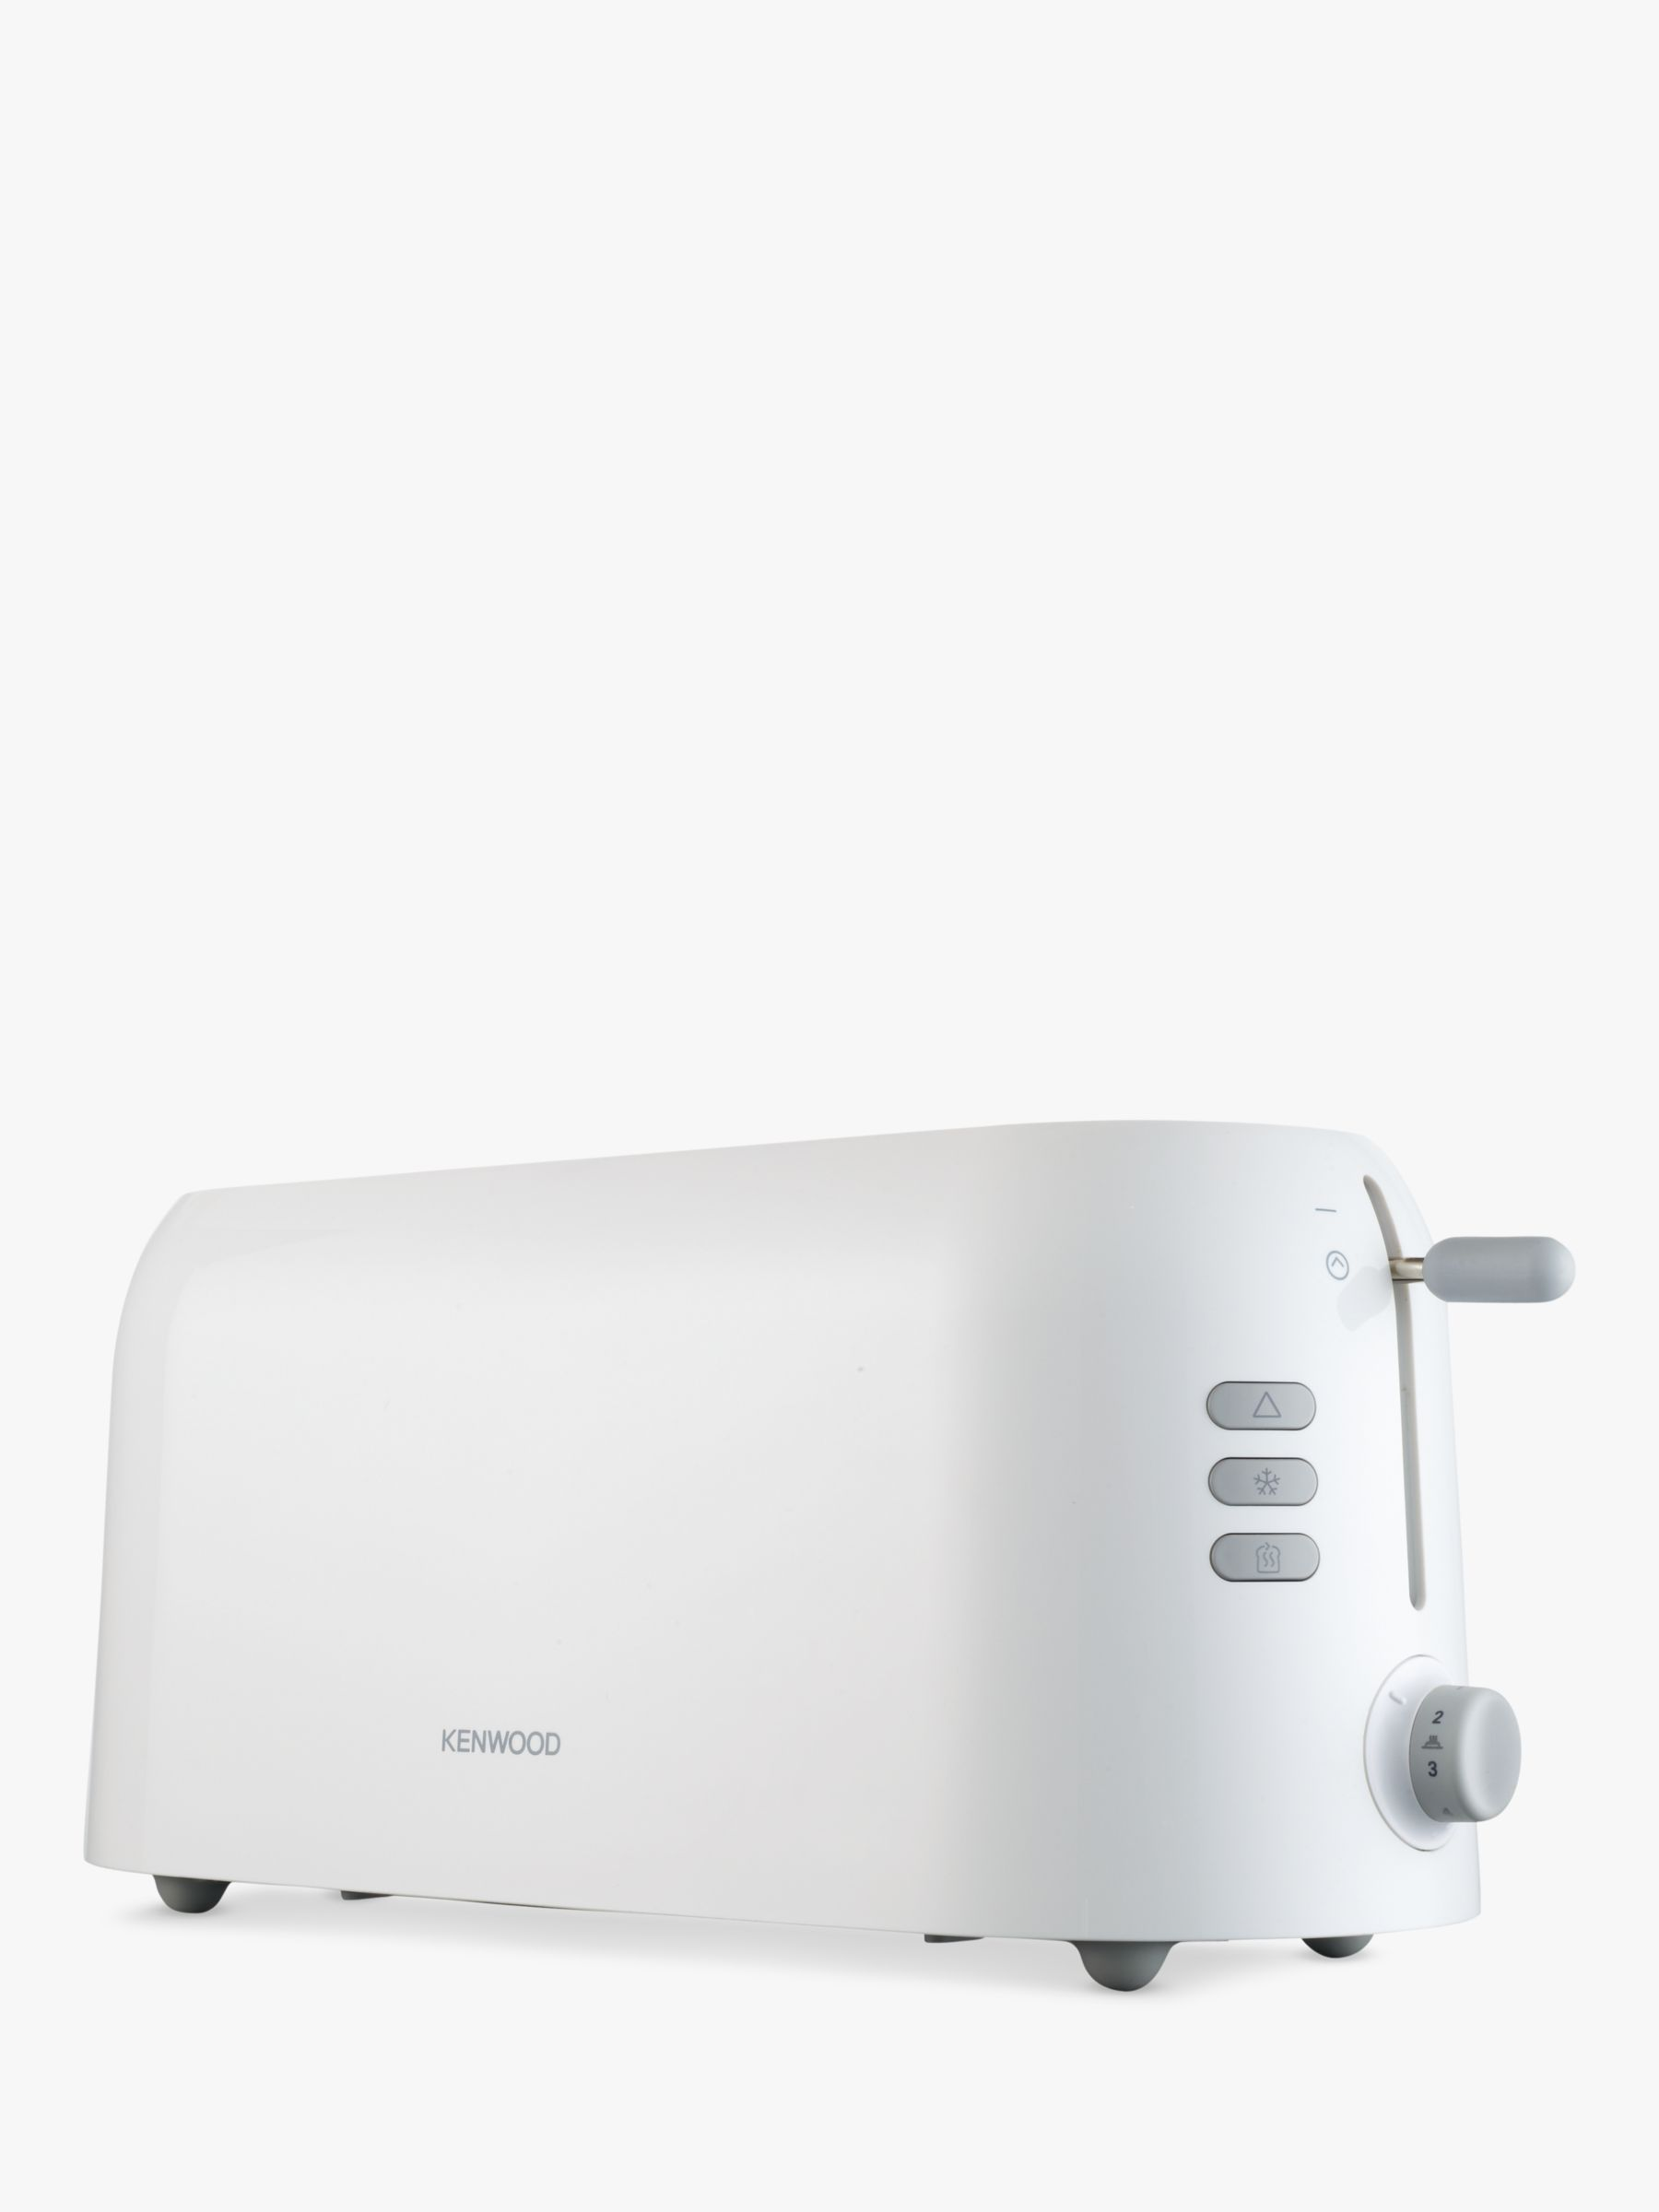 Kenwood Kenwood TTP210 4-Slice Long Toaster, White